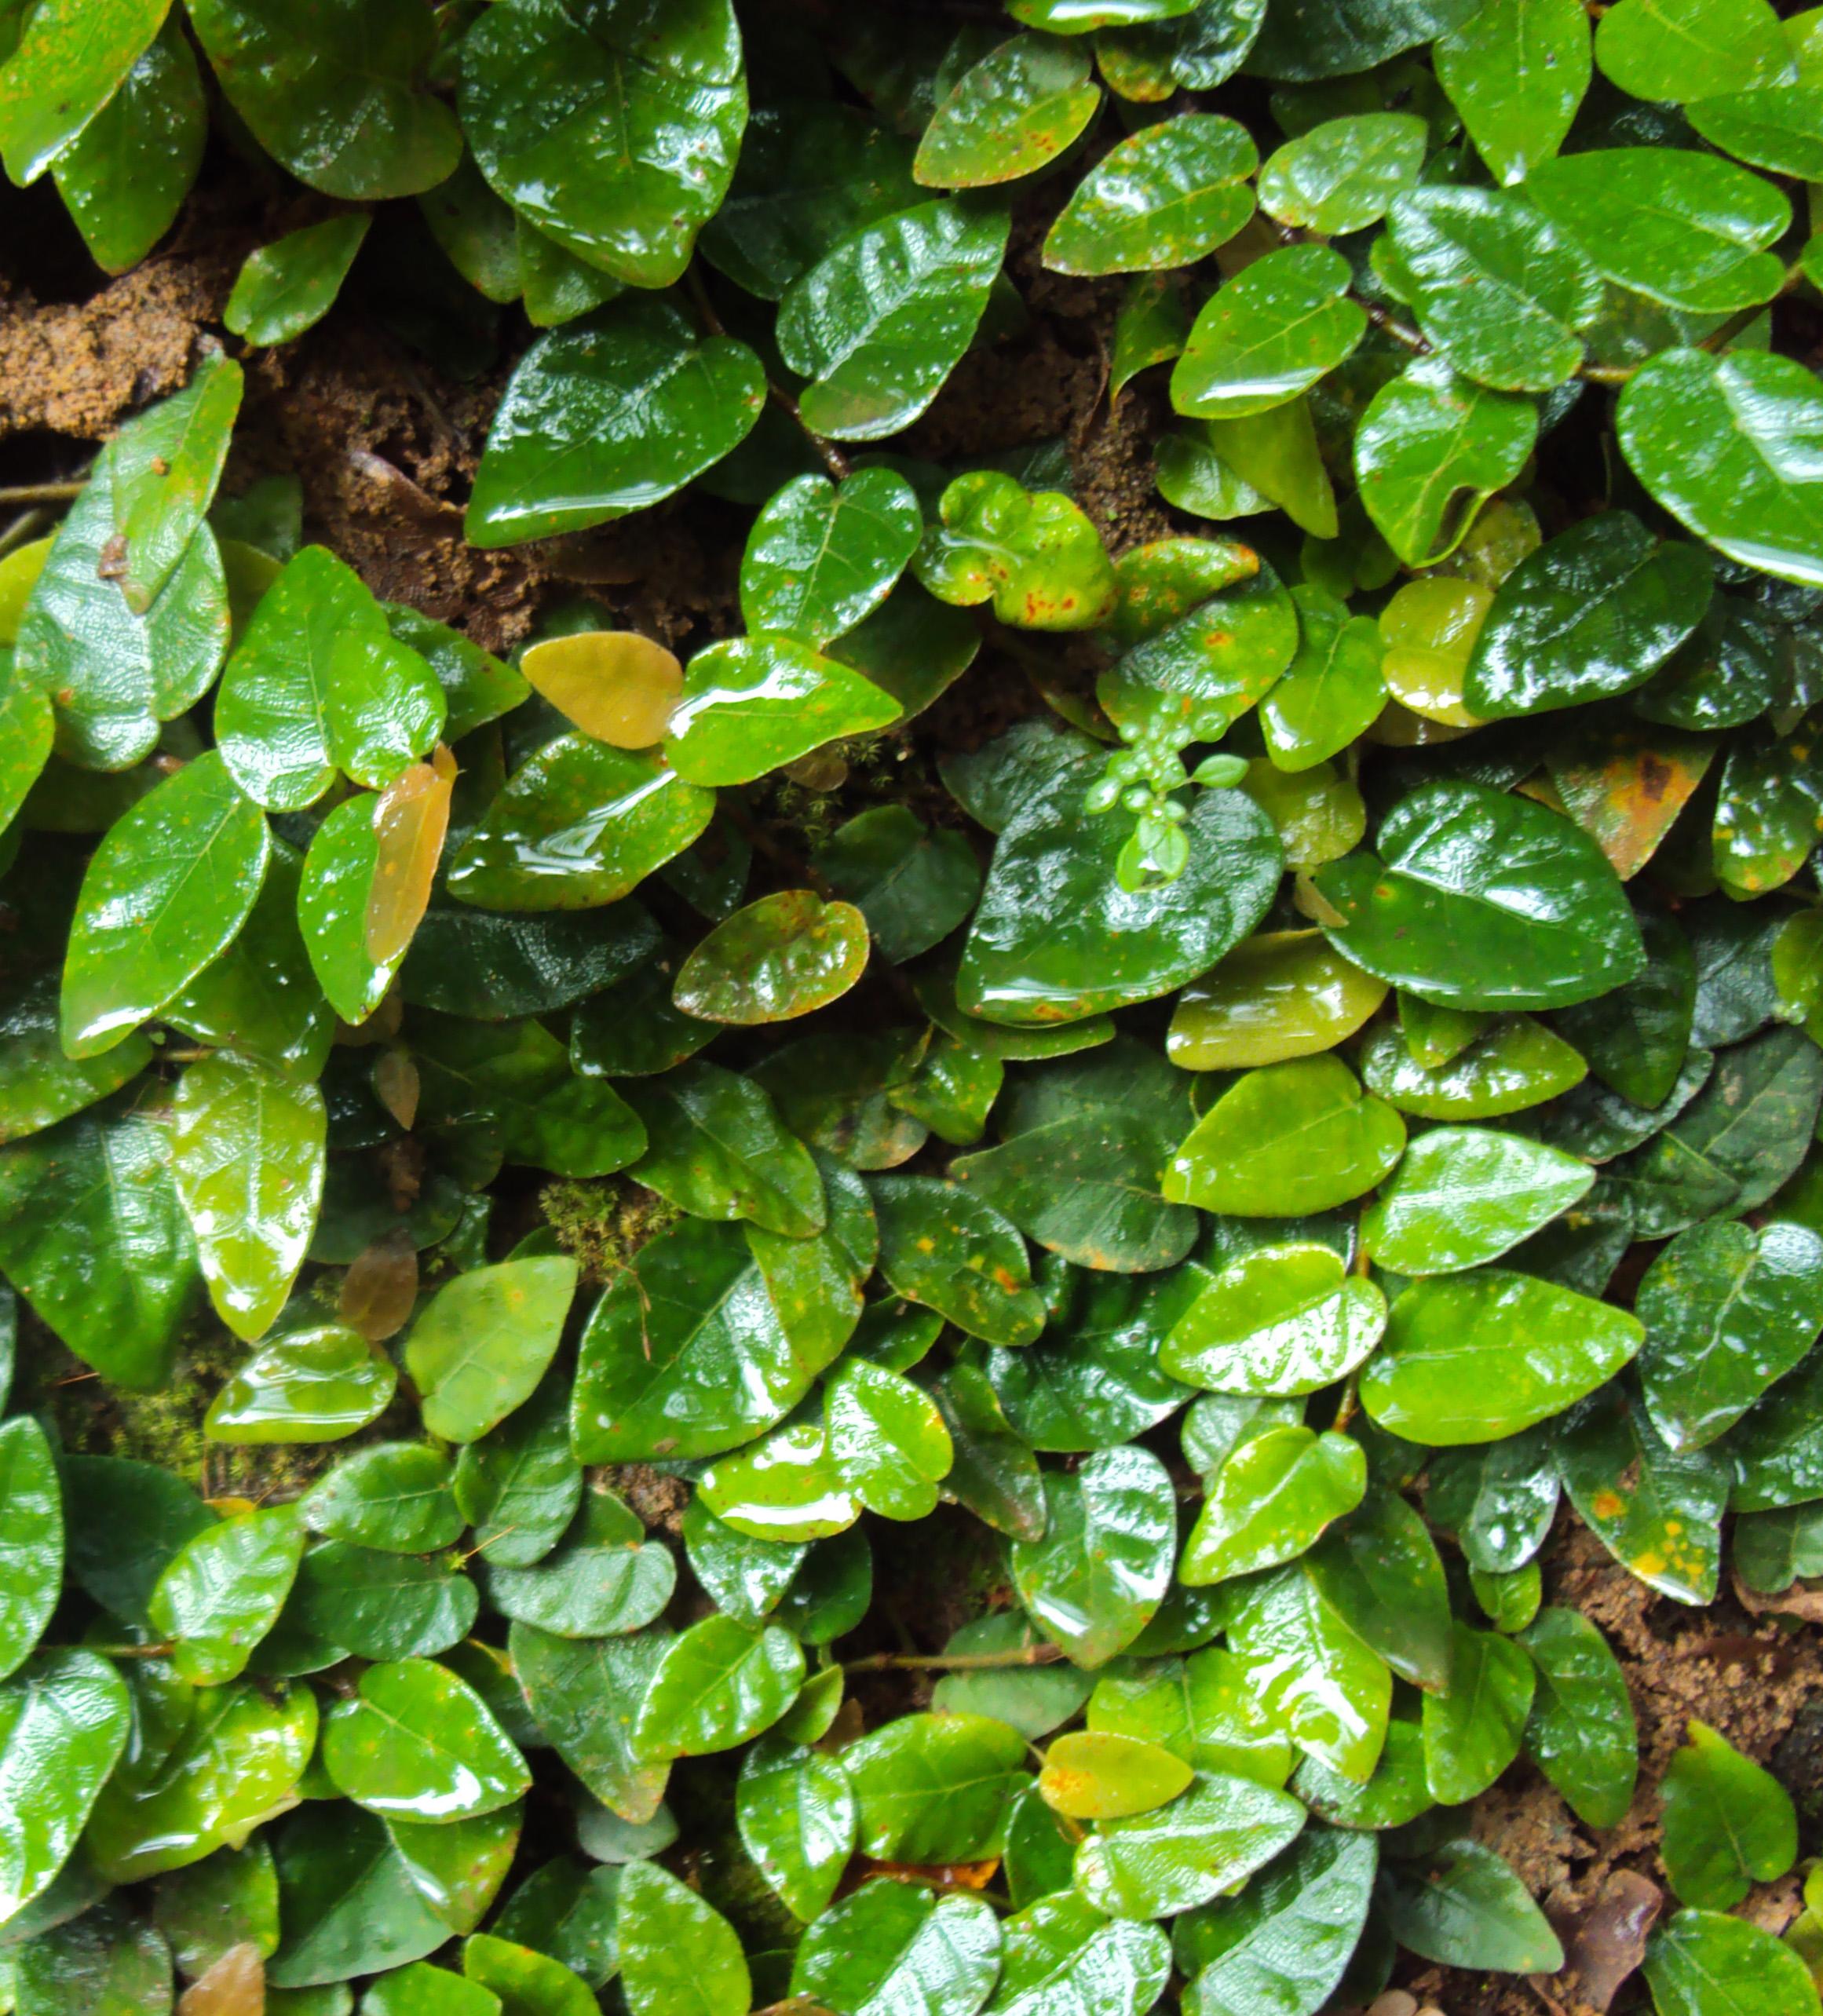 Ficus_pumila_plant_on_a_wall